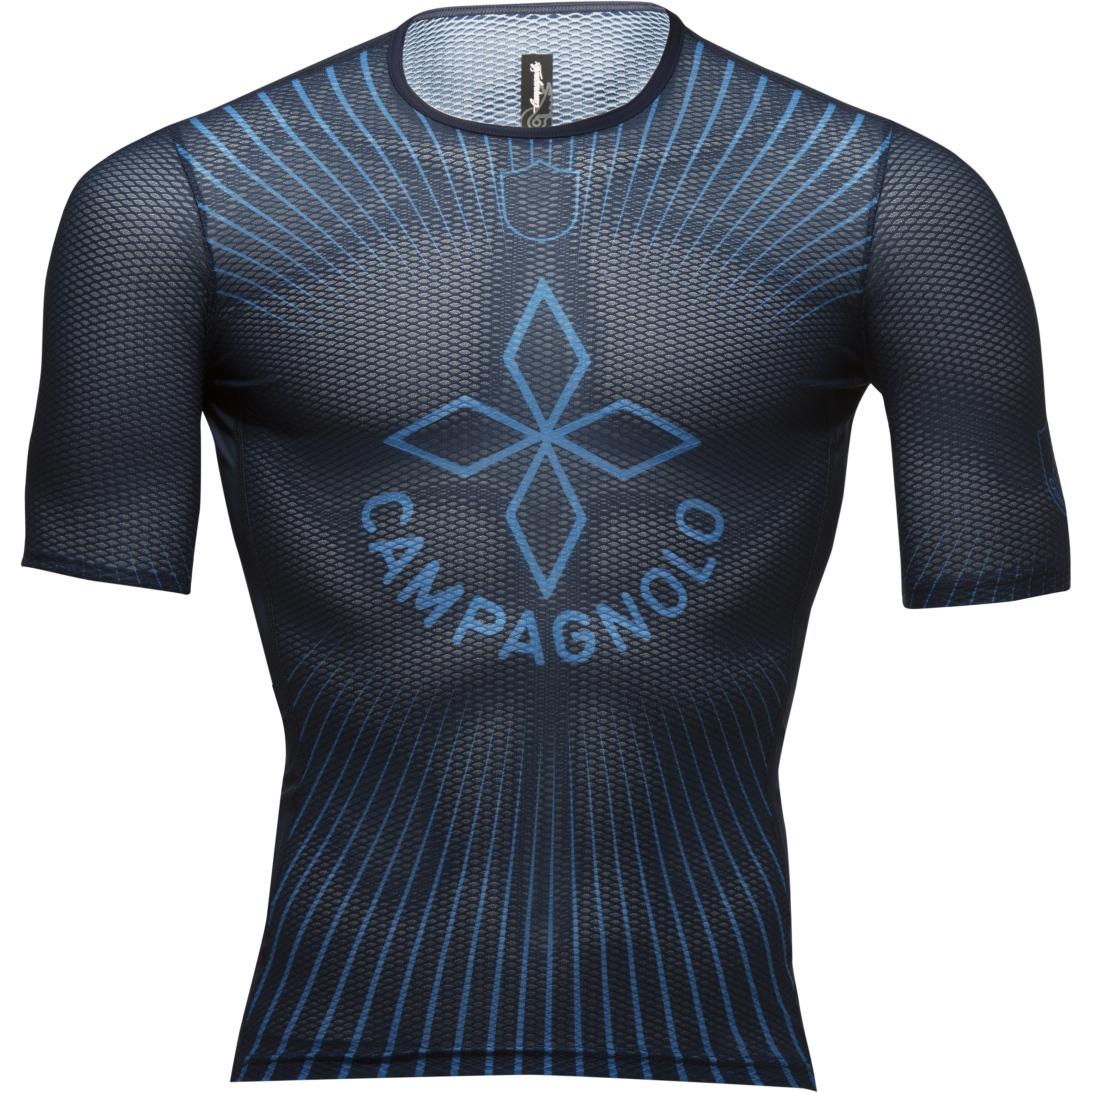 Campagnolo Litech Mesh Base Layer Undershirt - blue